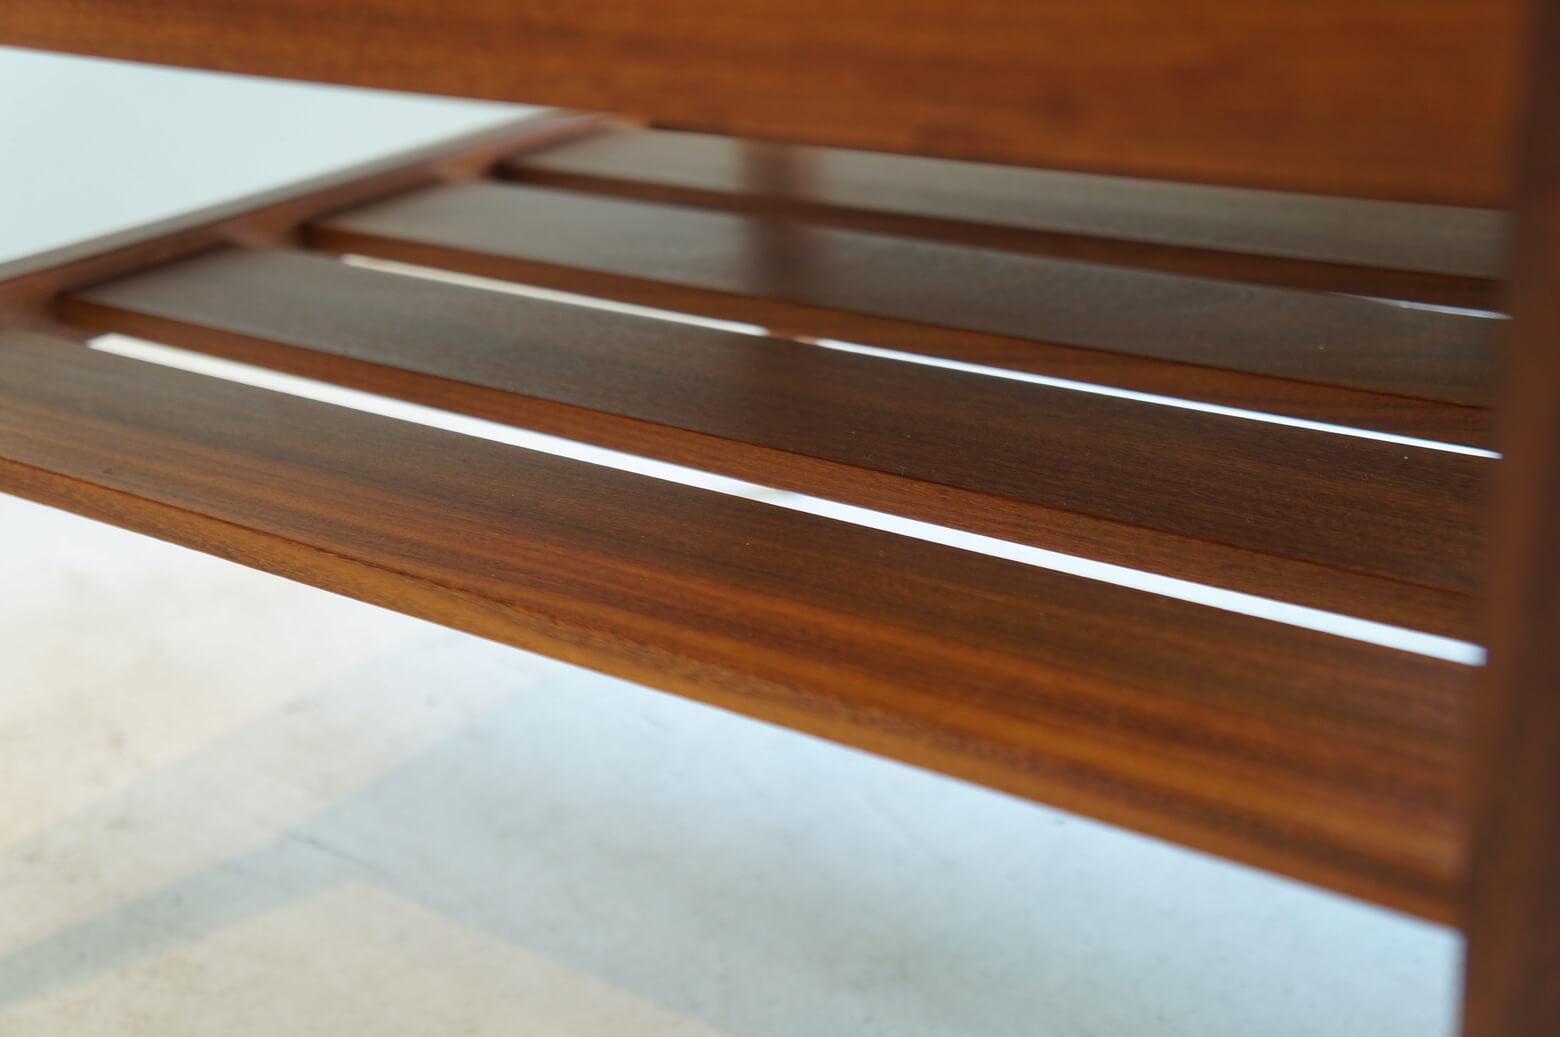 Danish Vintage Square Low Table/デンマーク ヴィンテージ スクエアローテーブル